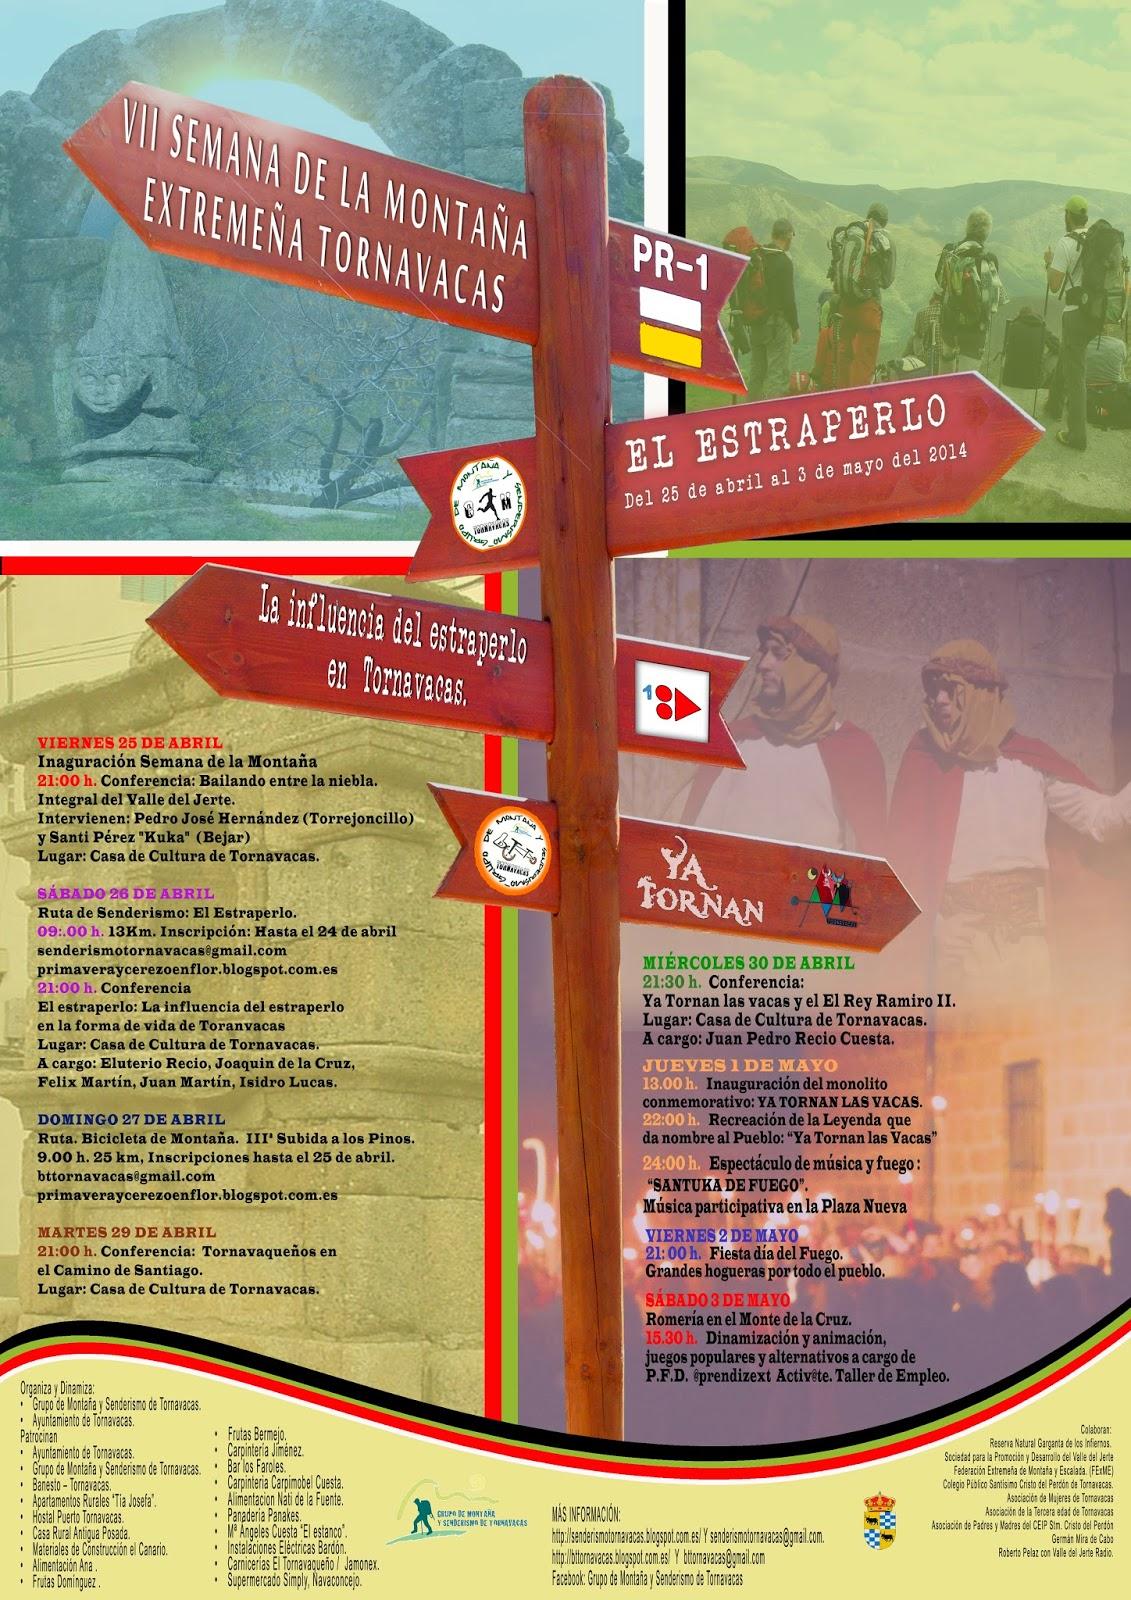 VII Semana de la Montaña Extremeña. Tornavacas. Valle del Jerte